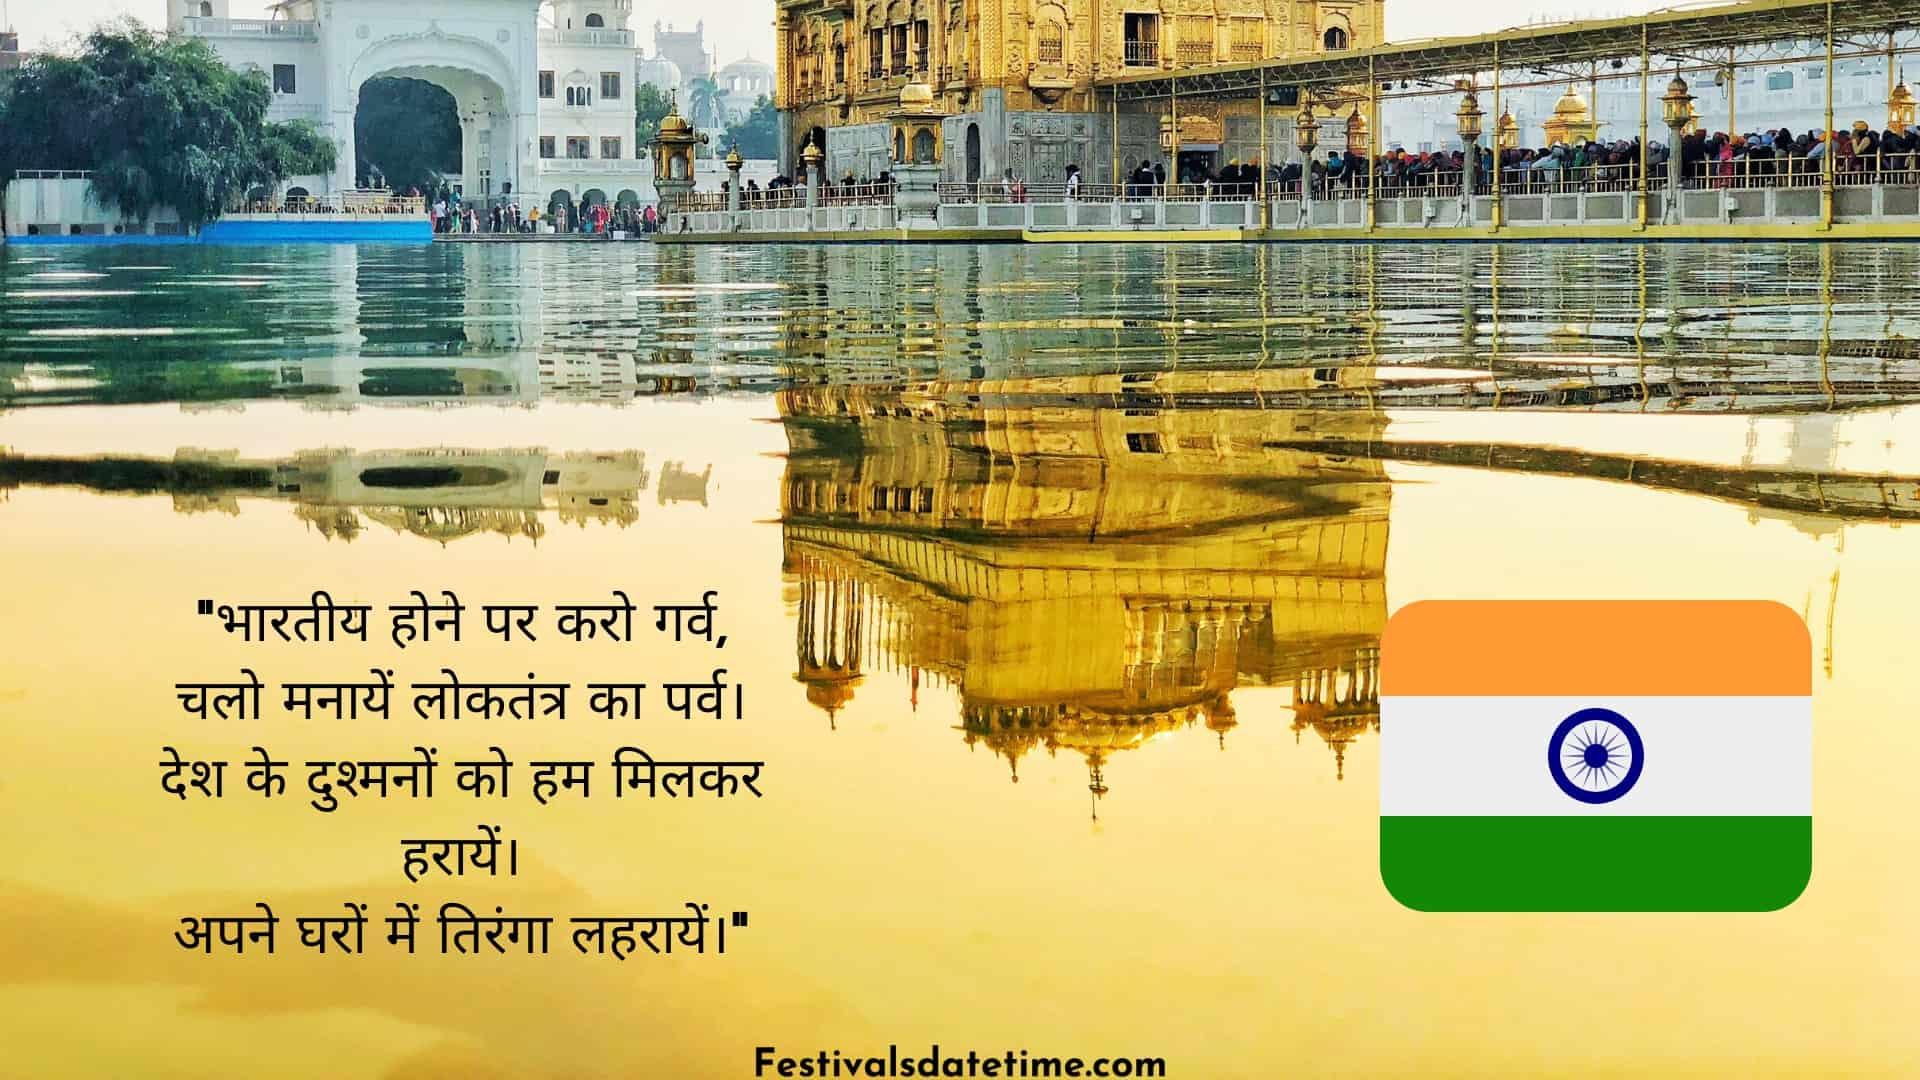 patriotic_quotes_in_hindi_for_republic_day